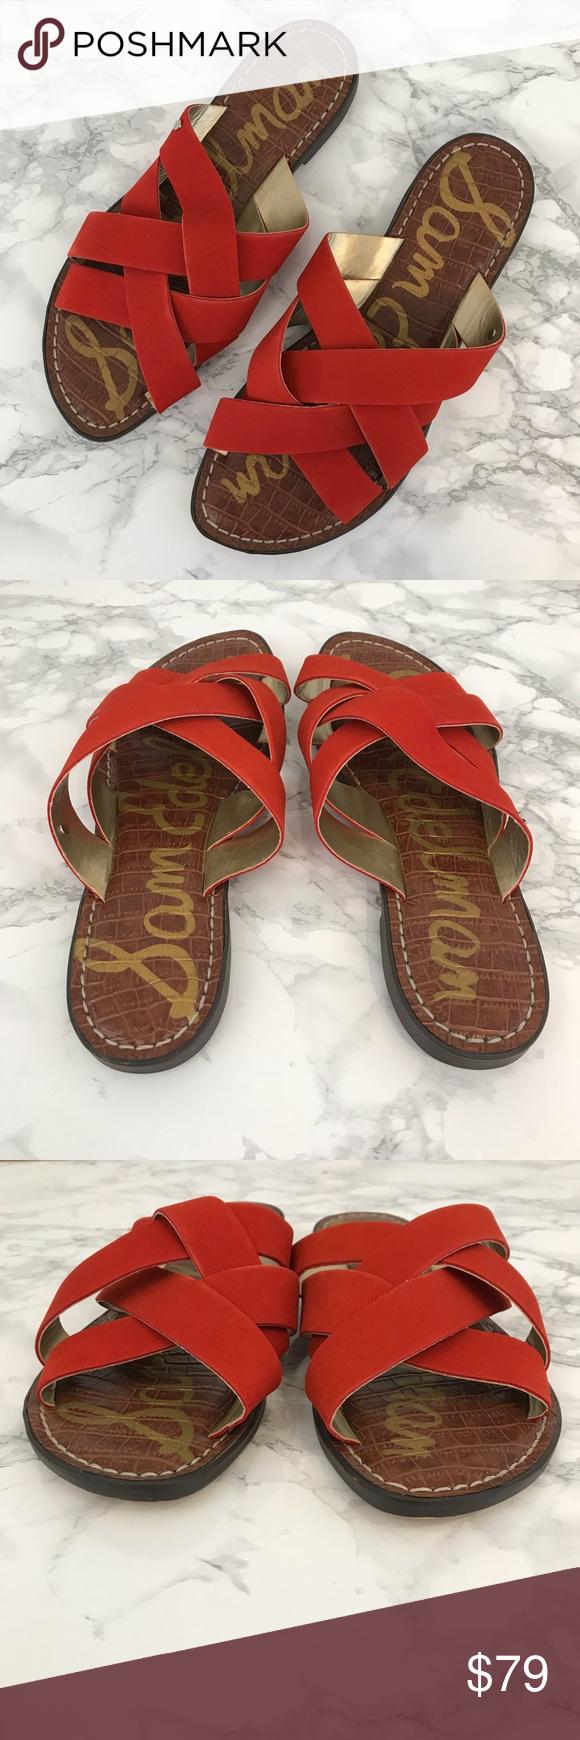 c126e6e0b67a Sam Edelman Gaile Slide Sandal Red 8.5 These sandals from Sam Edelman are a  beautiful shade